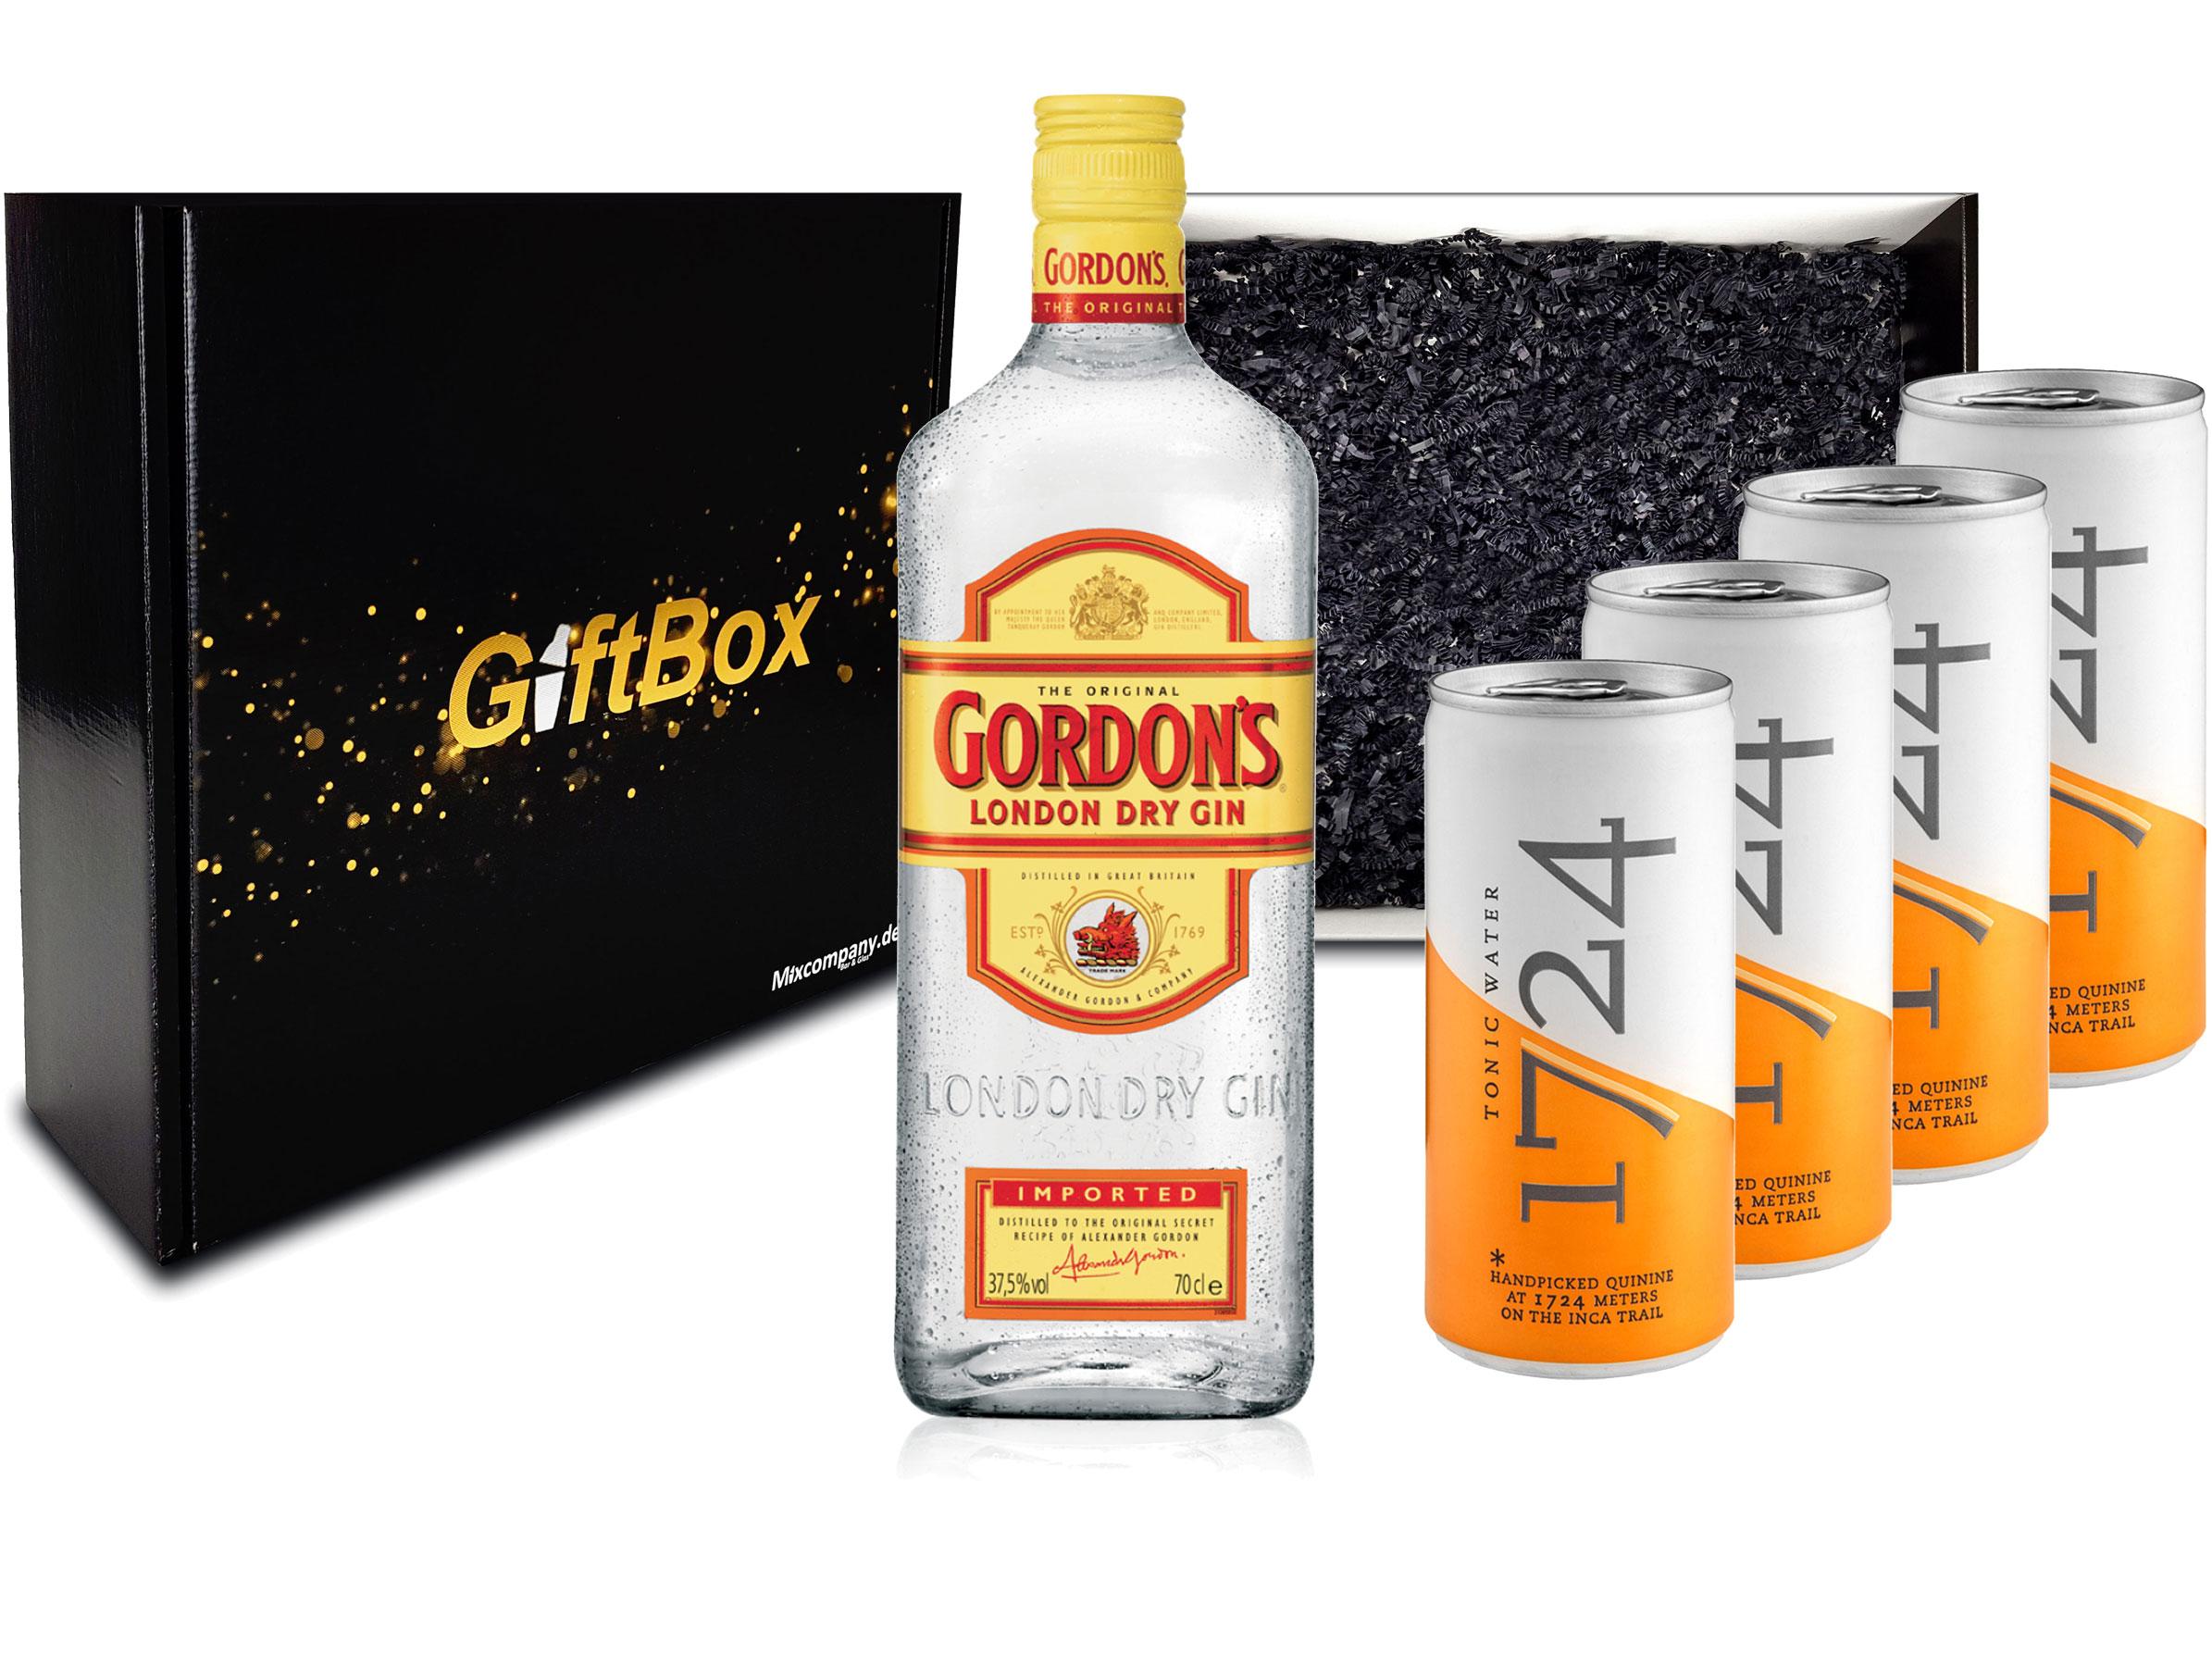 Gin Tonic Set Giftbox Geschenkset - Gordons London Dry Gin 0,7l 700ml (37,5% Vol) + 4x 1724 Tonic Water Dose 200ml inkl. Pfand EINWEG -[Enthält Sulfite]